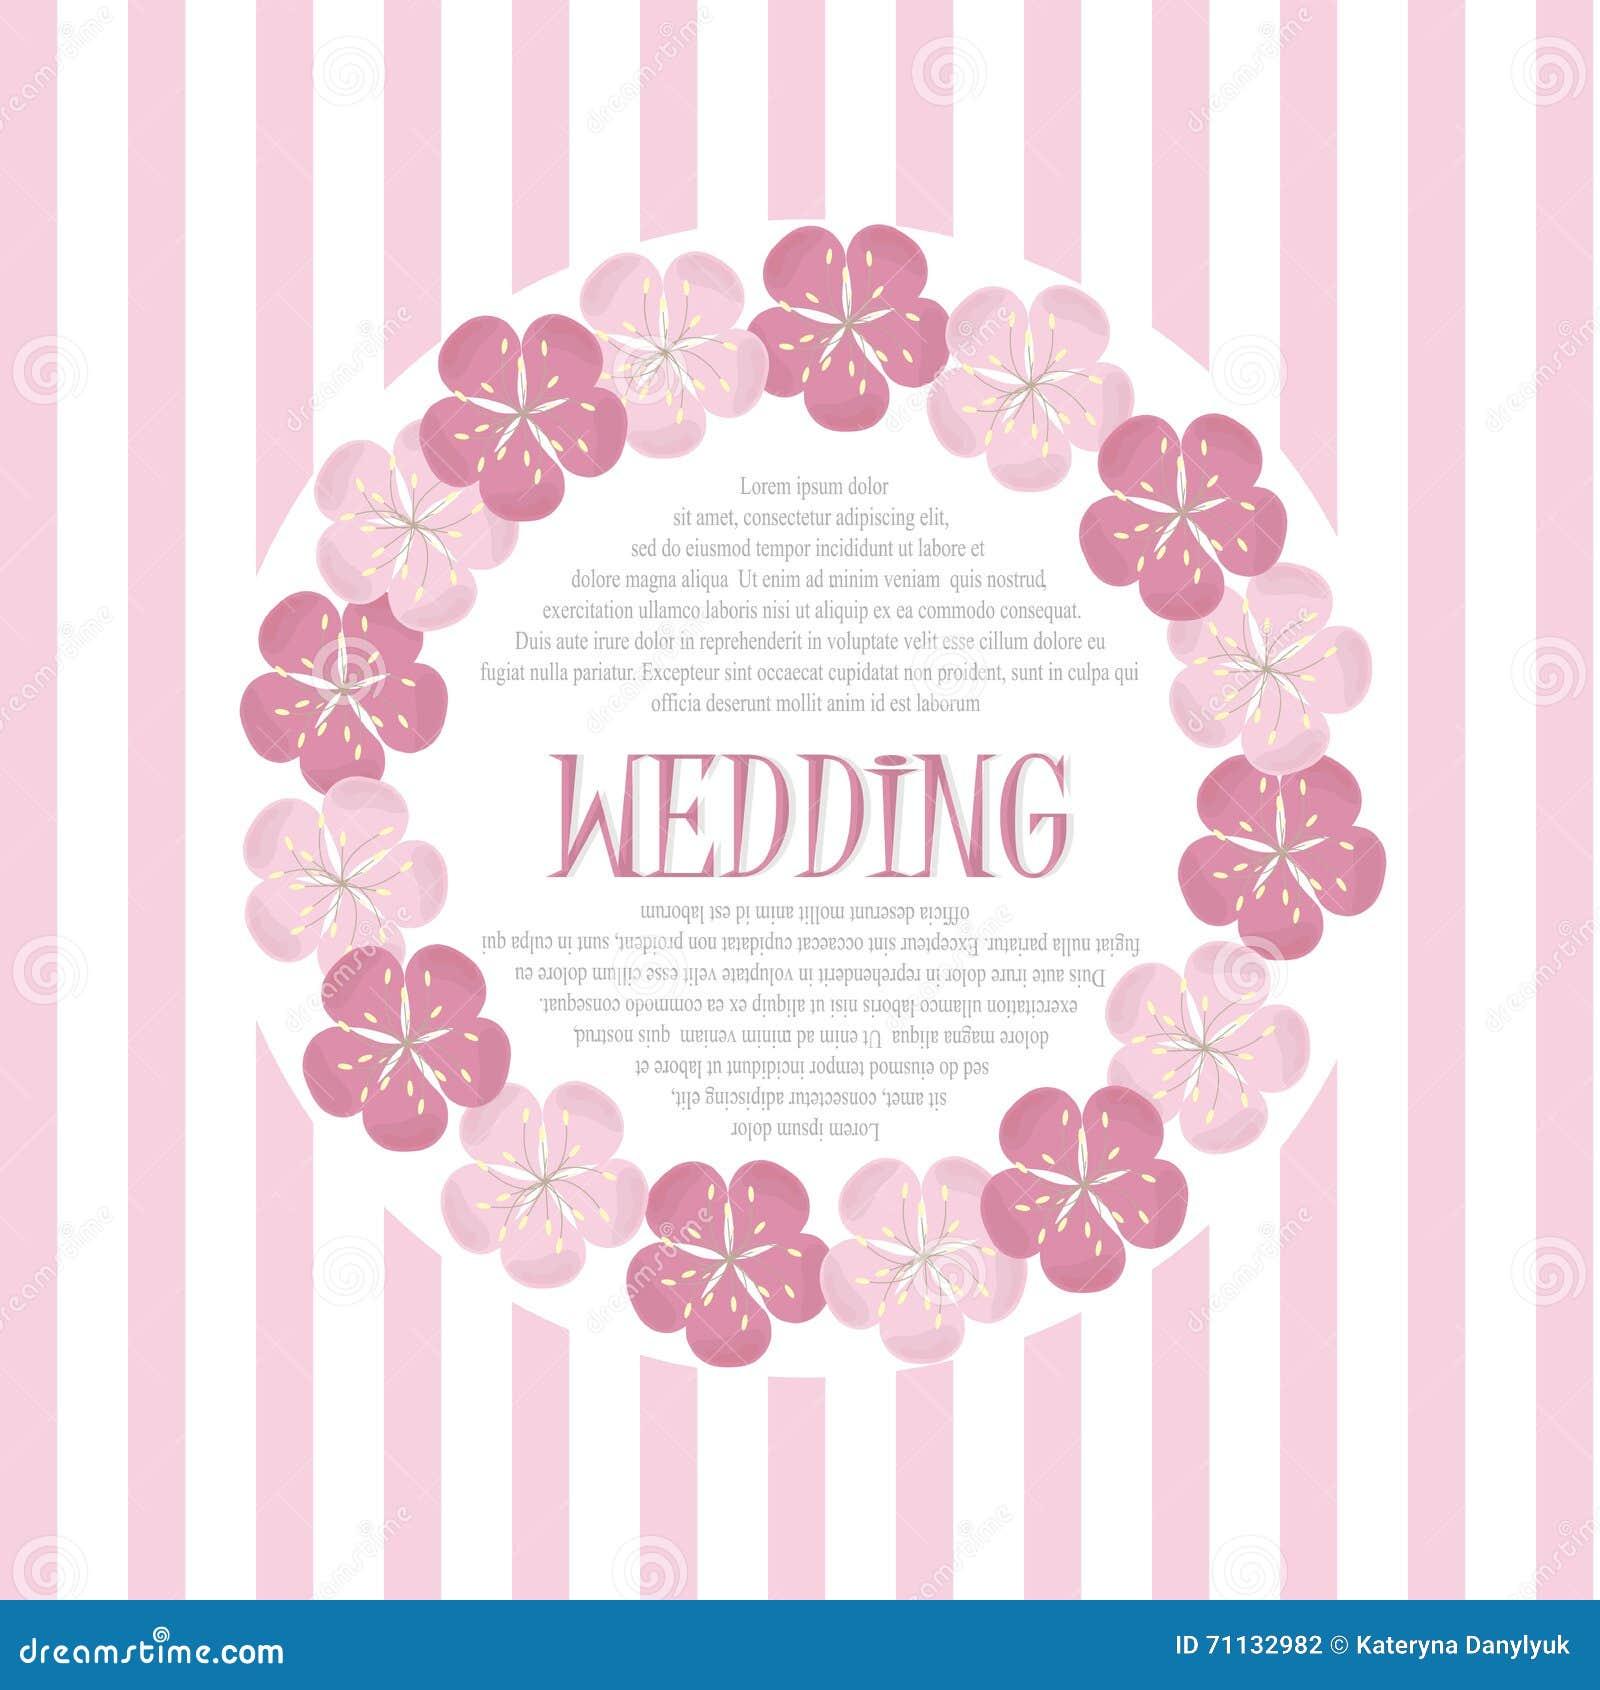 Download Pink Flower Wedding Vector Invitation Flowers: Beautiful Vintage Floral Wedding Invitation Card, Hand